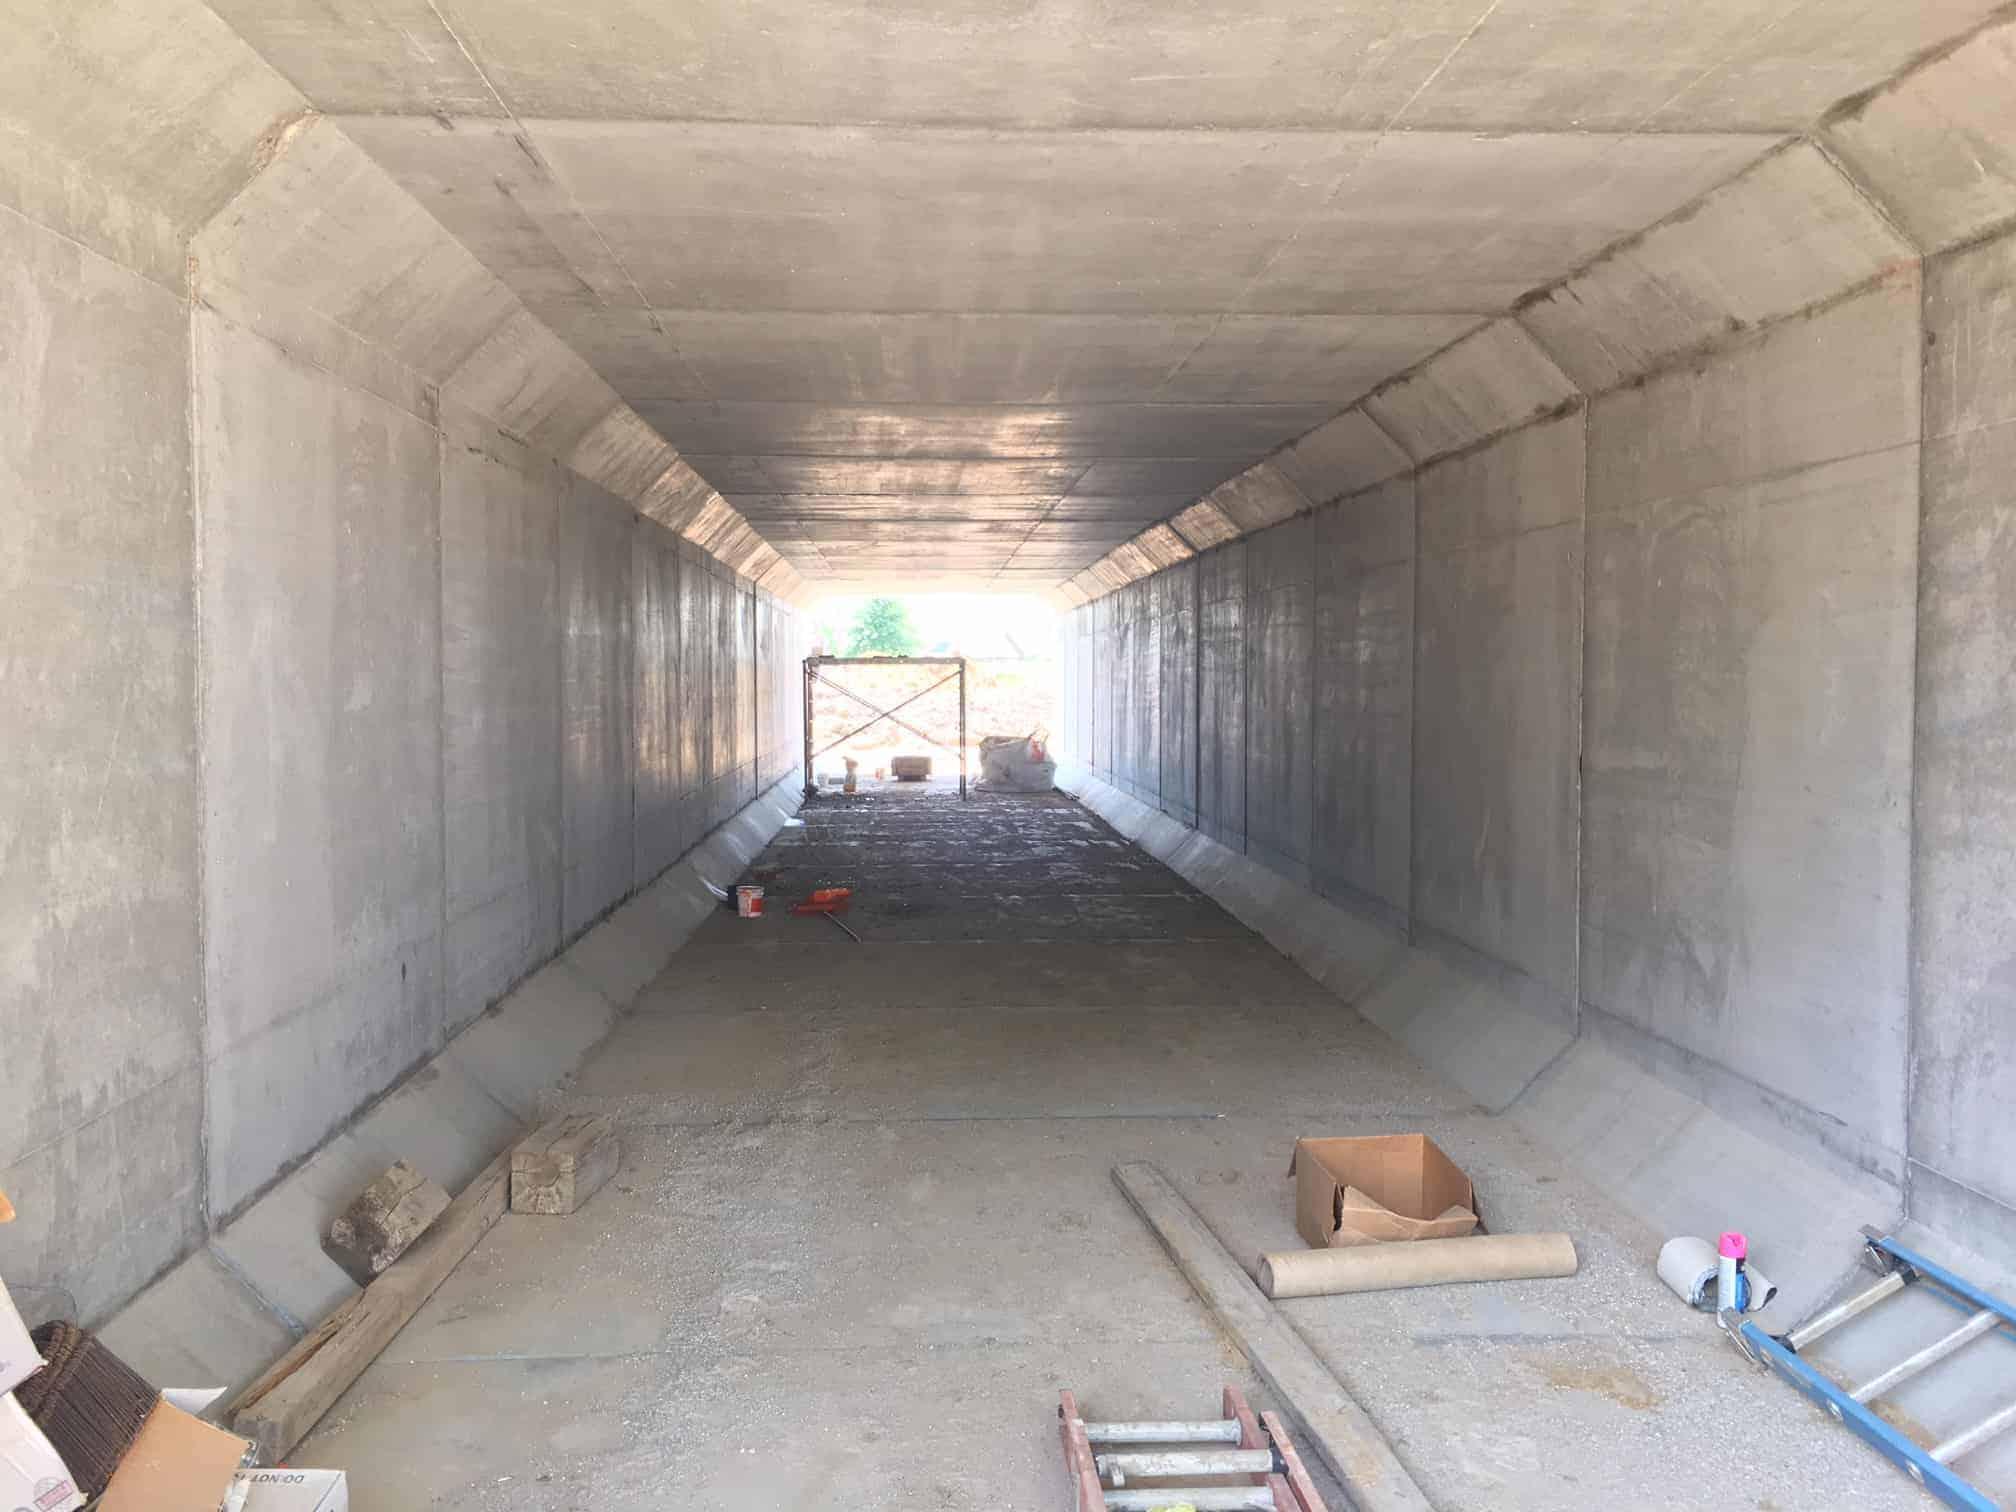 Box Culvert Pedestrian Underpass by Wieser Concrete